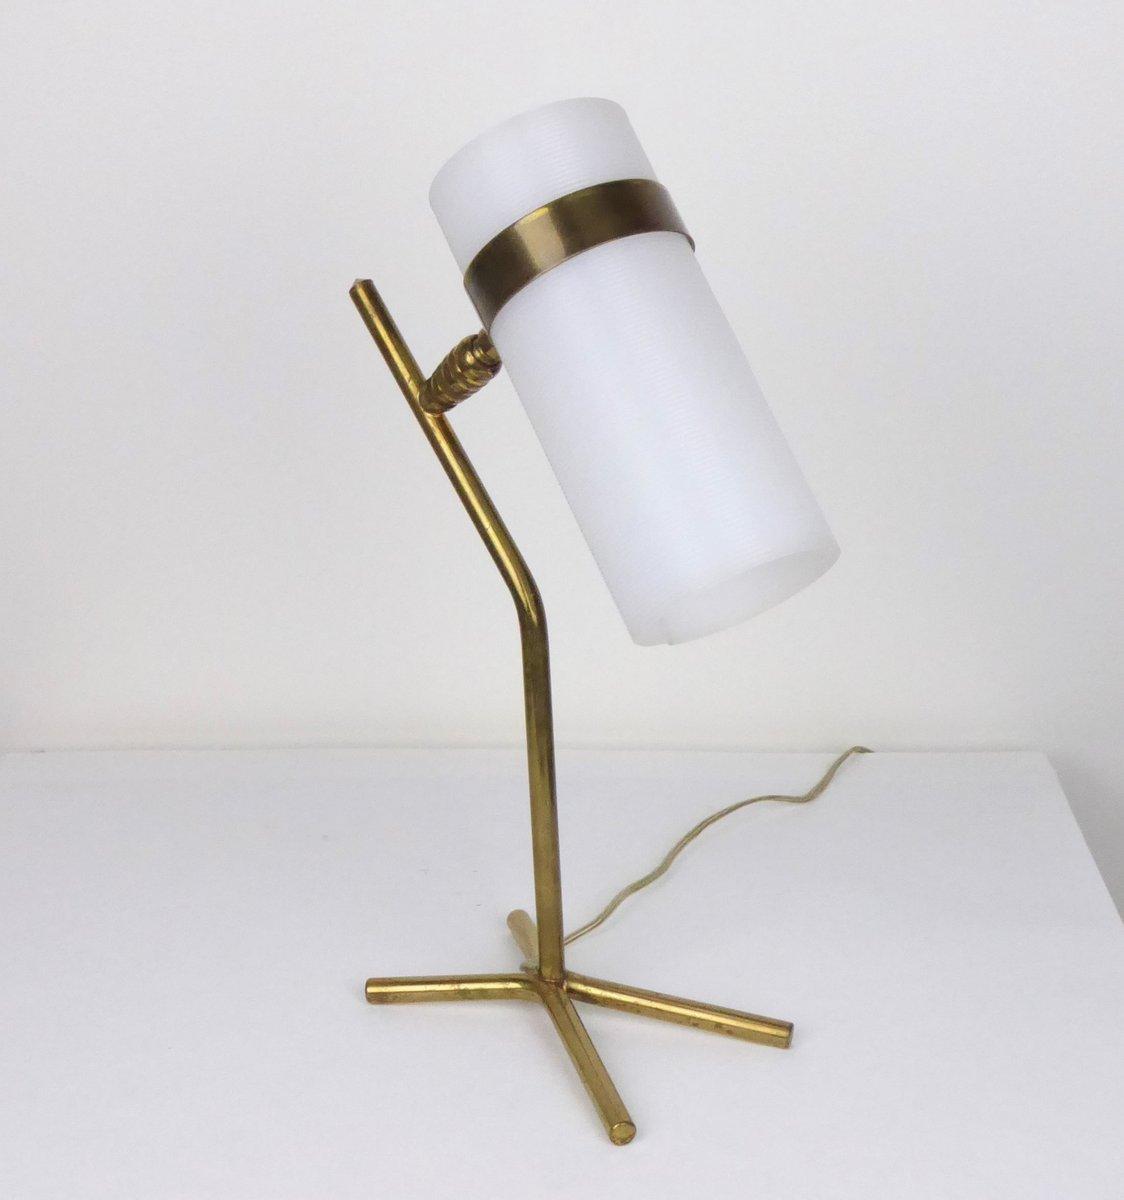 Tischlampe von Pierre Guariche & Boris Jean Lacroix, 1950er